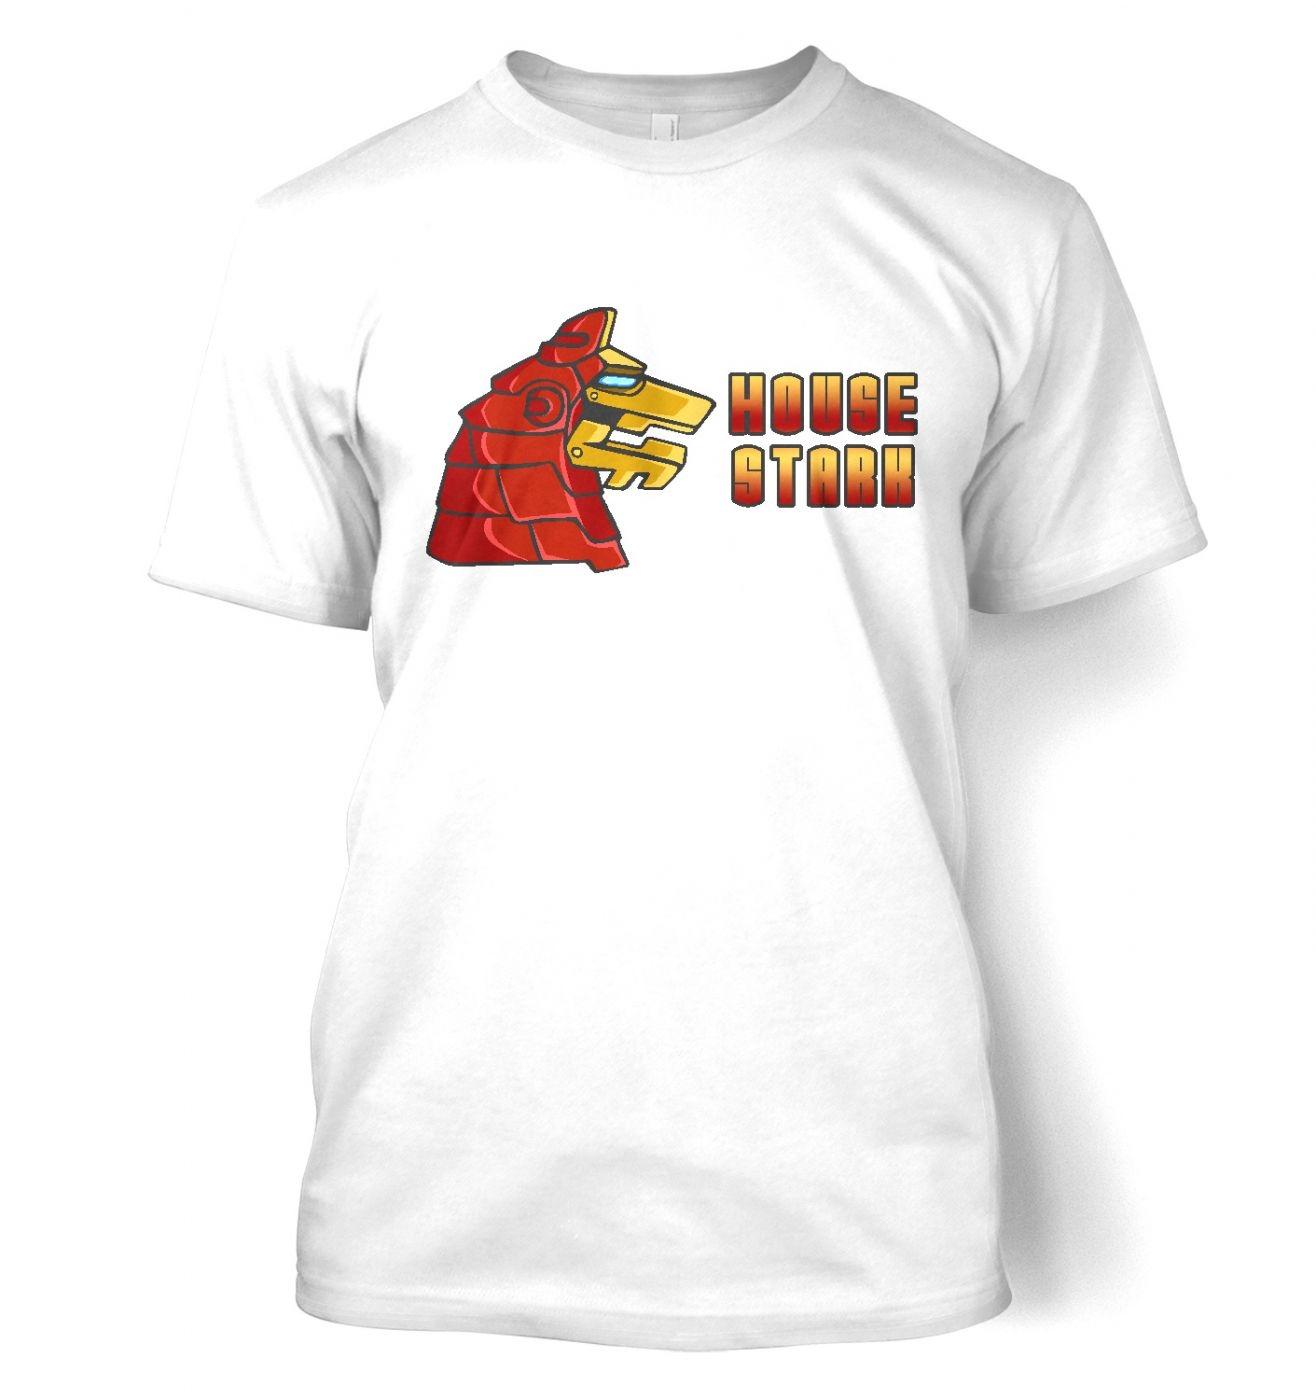 House Stark Industries t-shirt